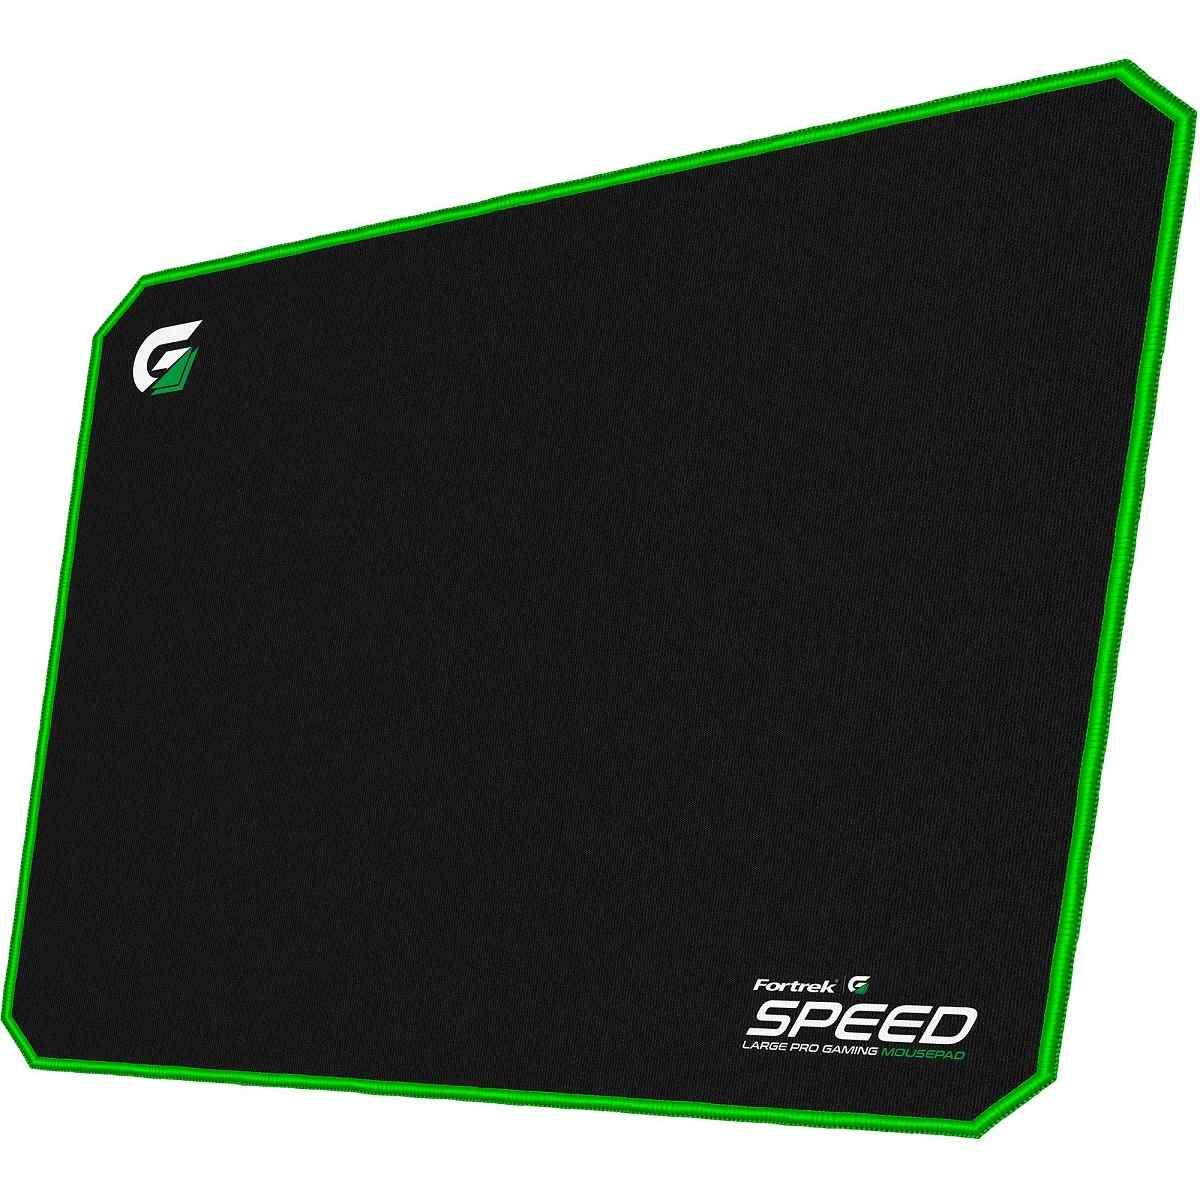 Mouse Pad Gamer (44x35cm) Speed MPG102 Preto/Verde Fortrek